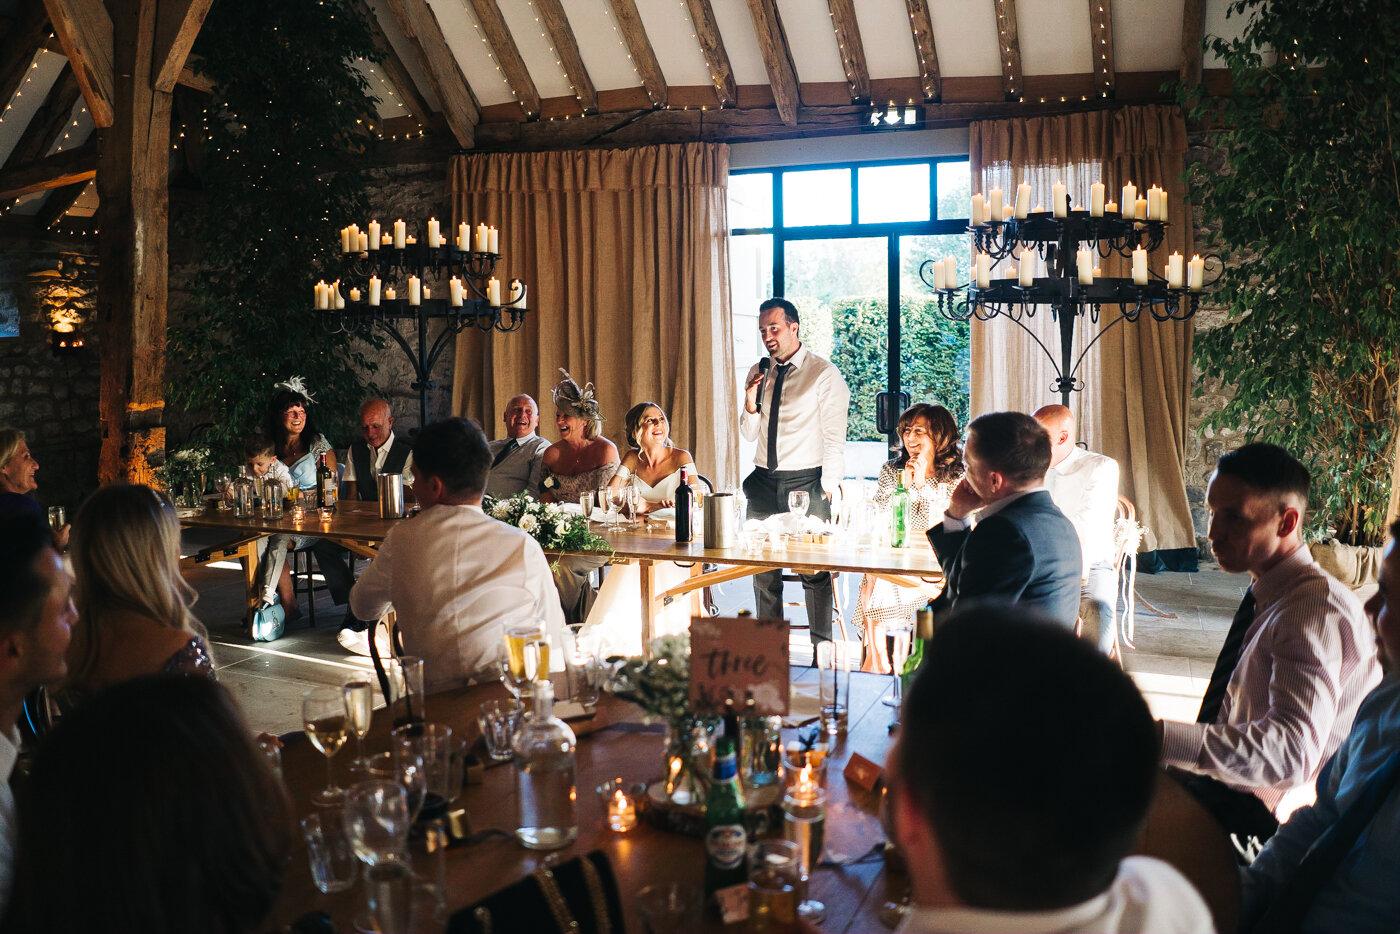 tithe-barn-bolton-abbey-north-yorkshire-cripps-wedding-photographer-creative-0046.jpg